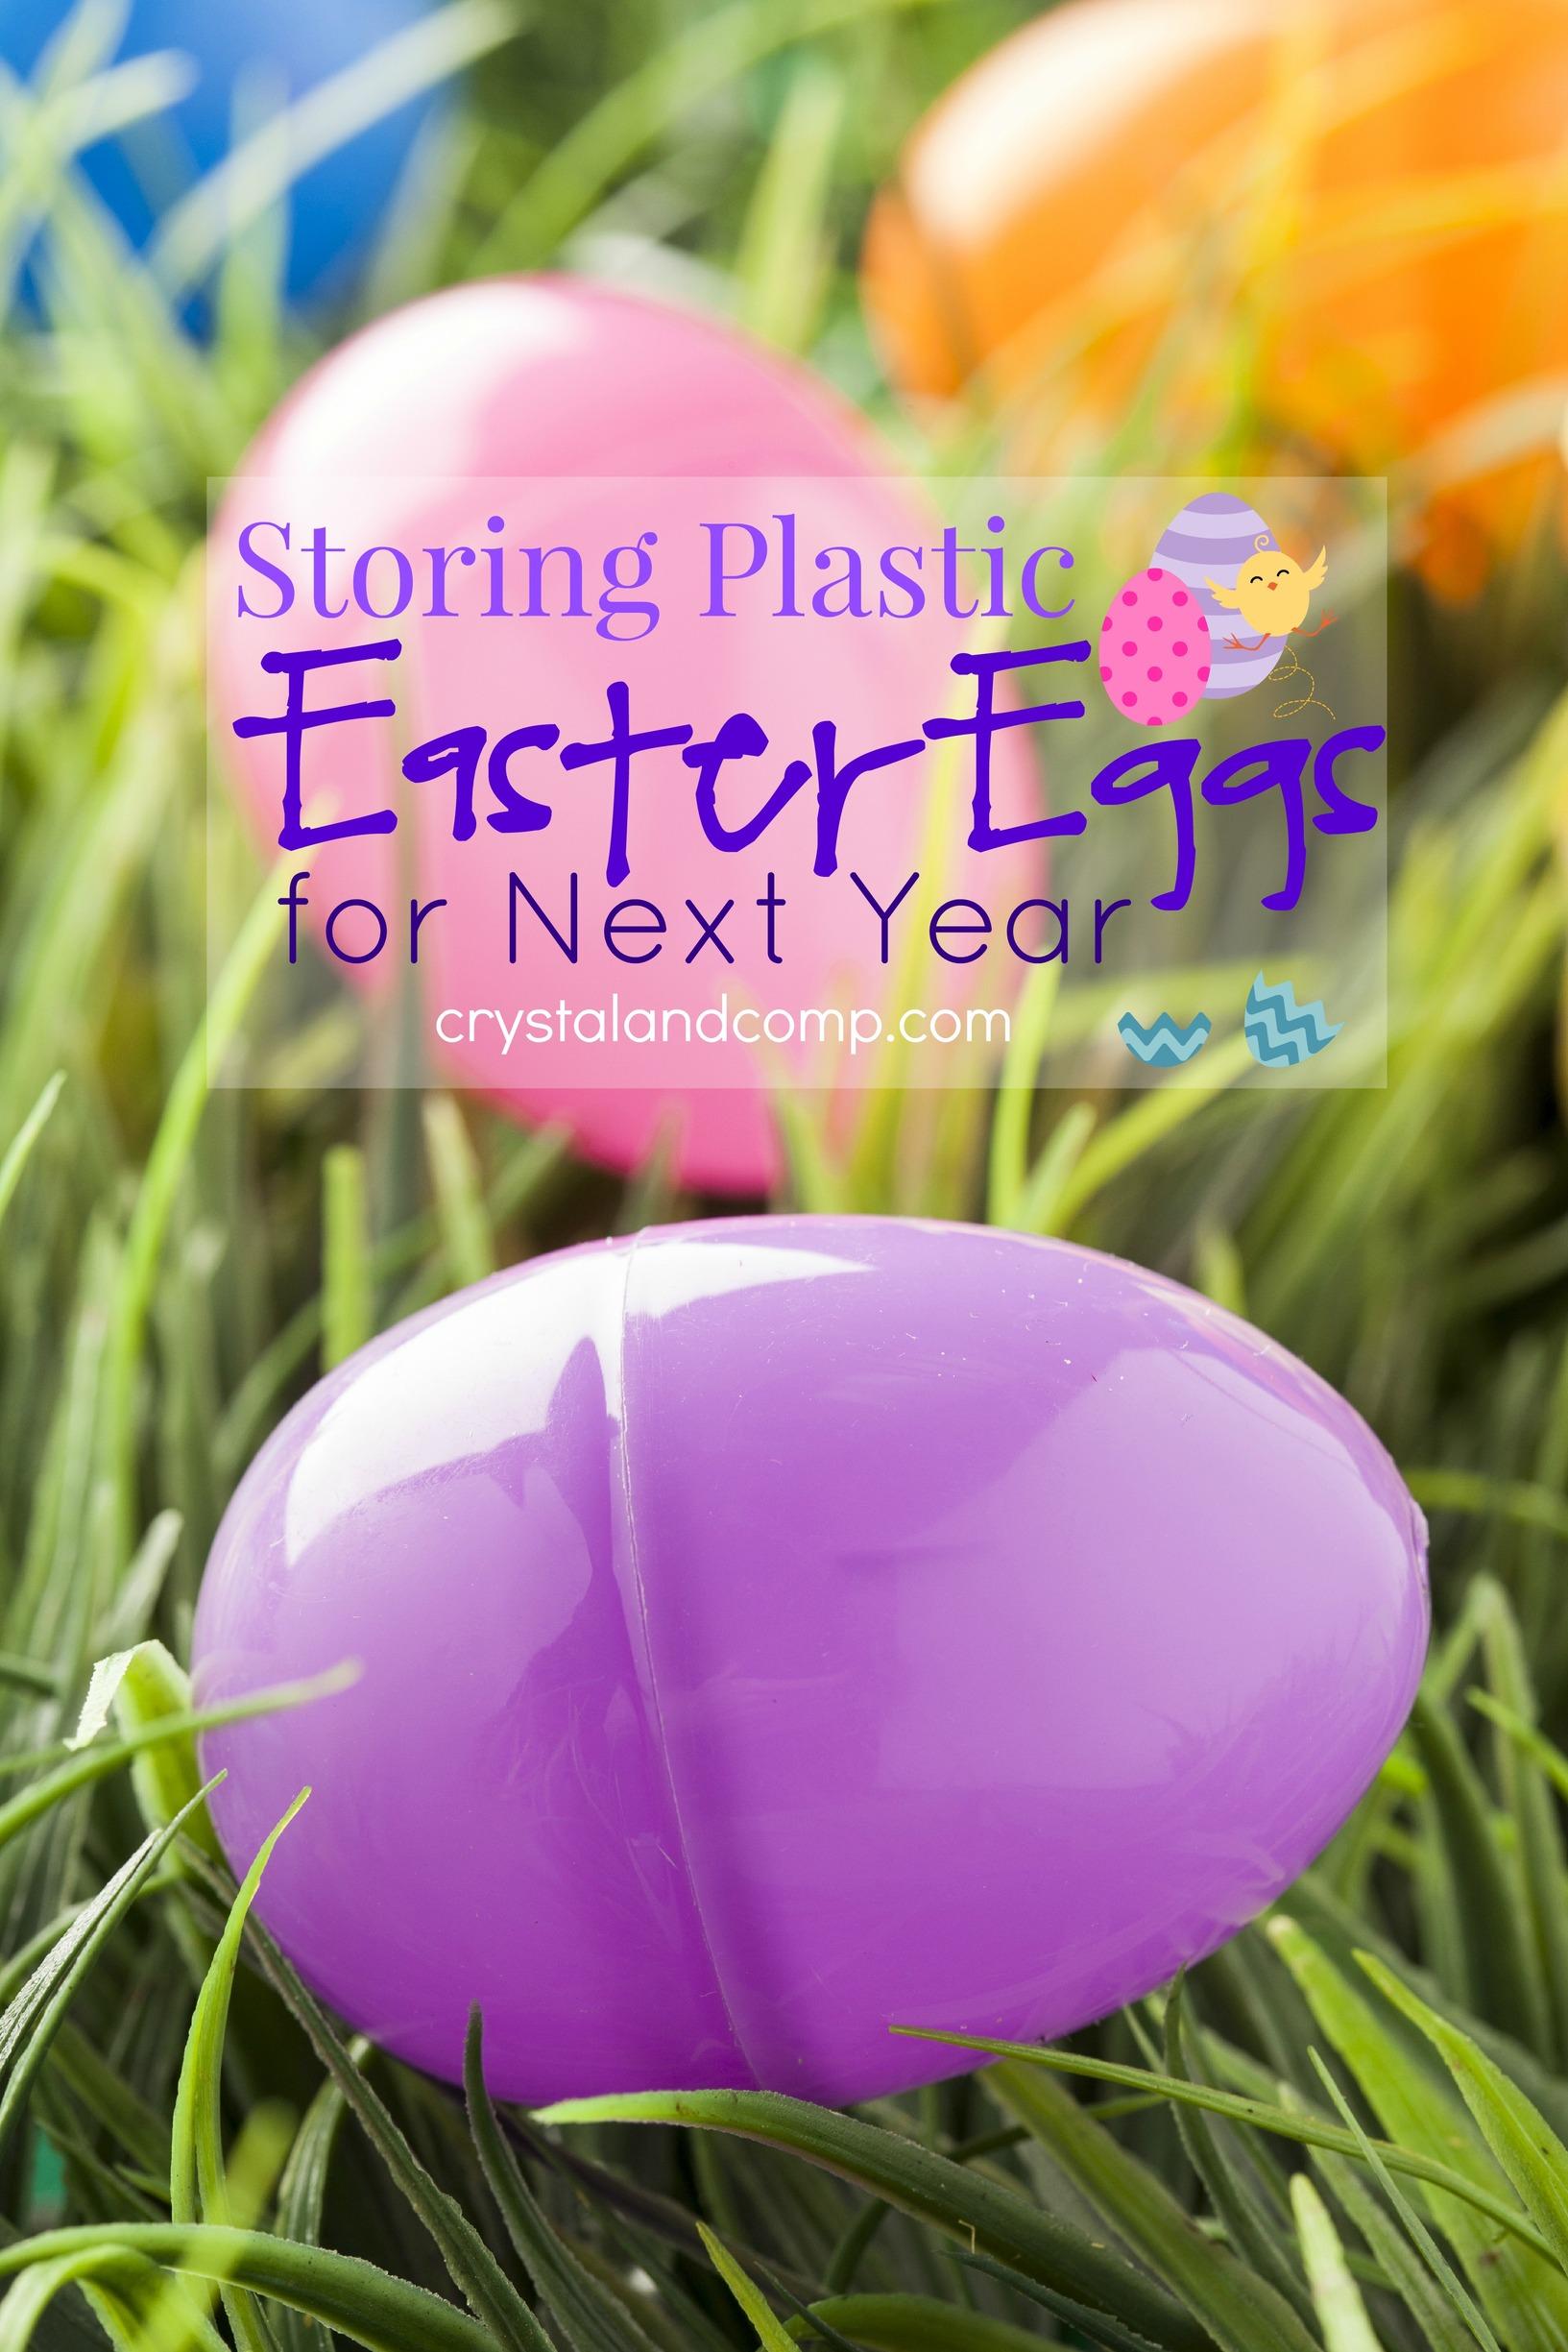 Storing Plastic Easter Eggs For Next Year